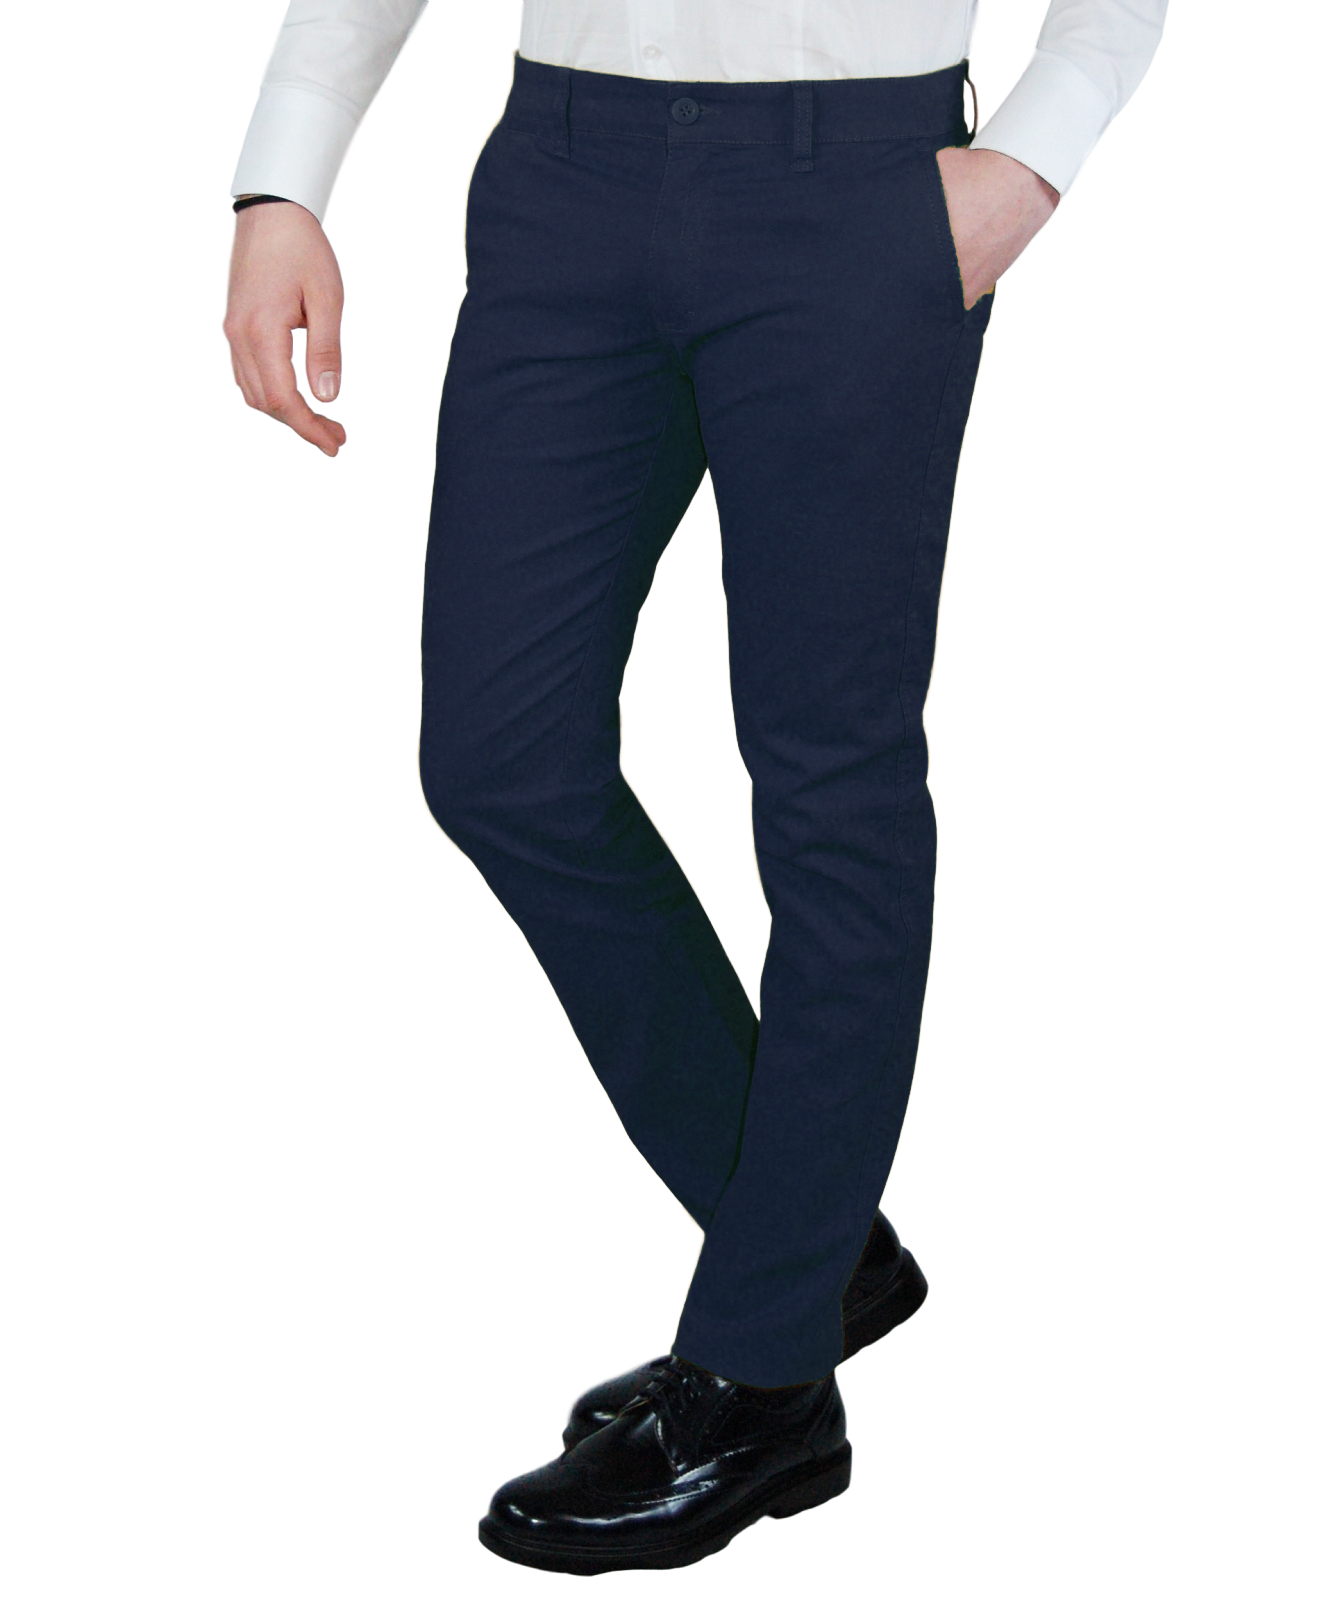 Pantalone-Uomo-Chino-Primaverile-slim-fit-Pantaloni-Eleganti-Blu-Verde-Nero miniatura 15